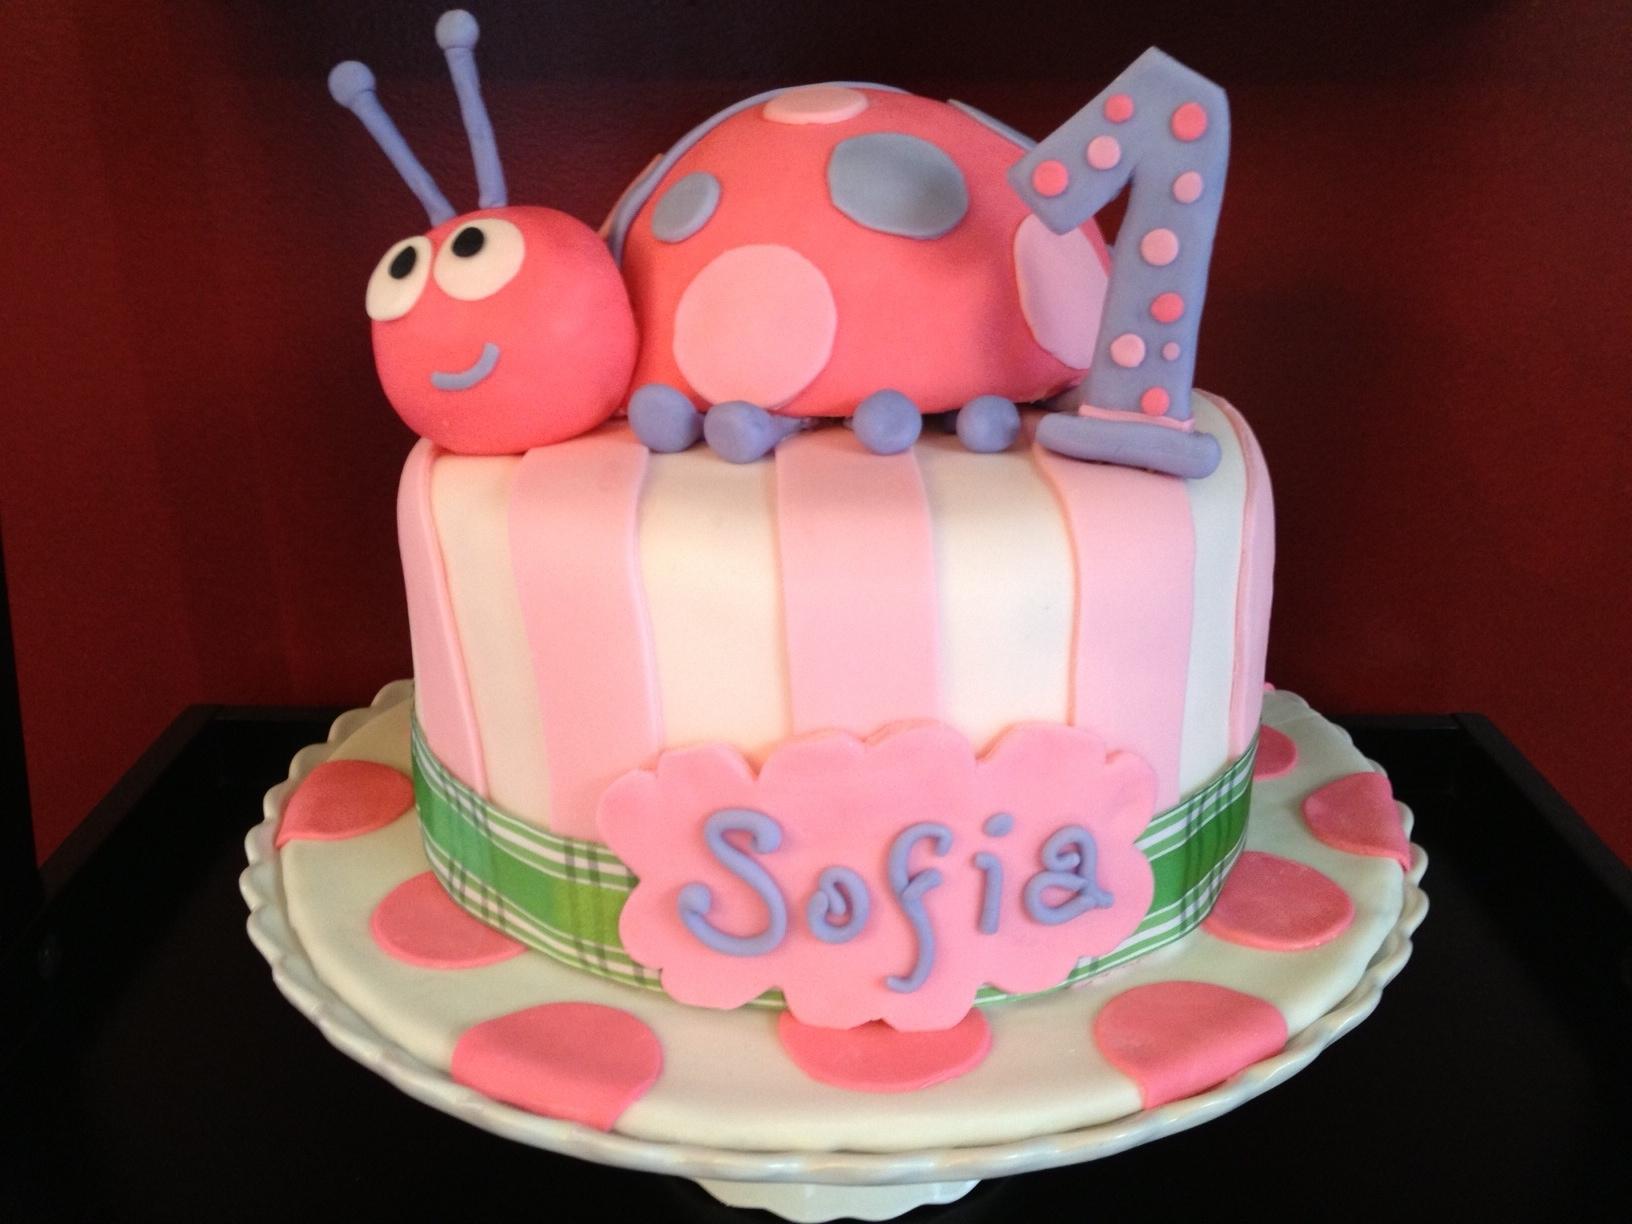 Girl cakes (1)